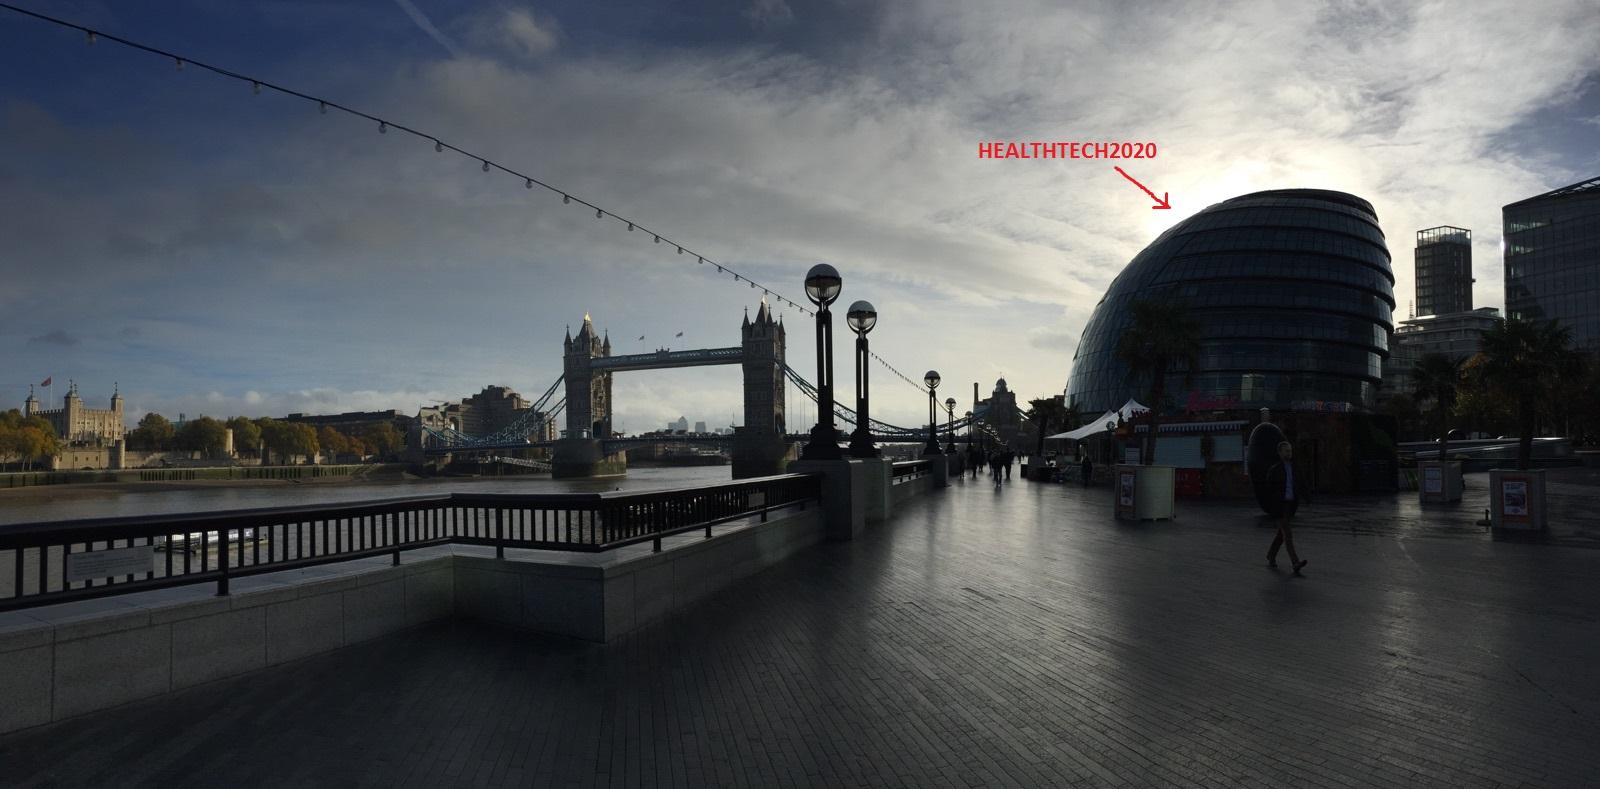 Health Tech 2020